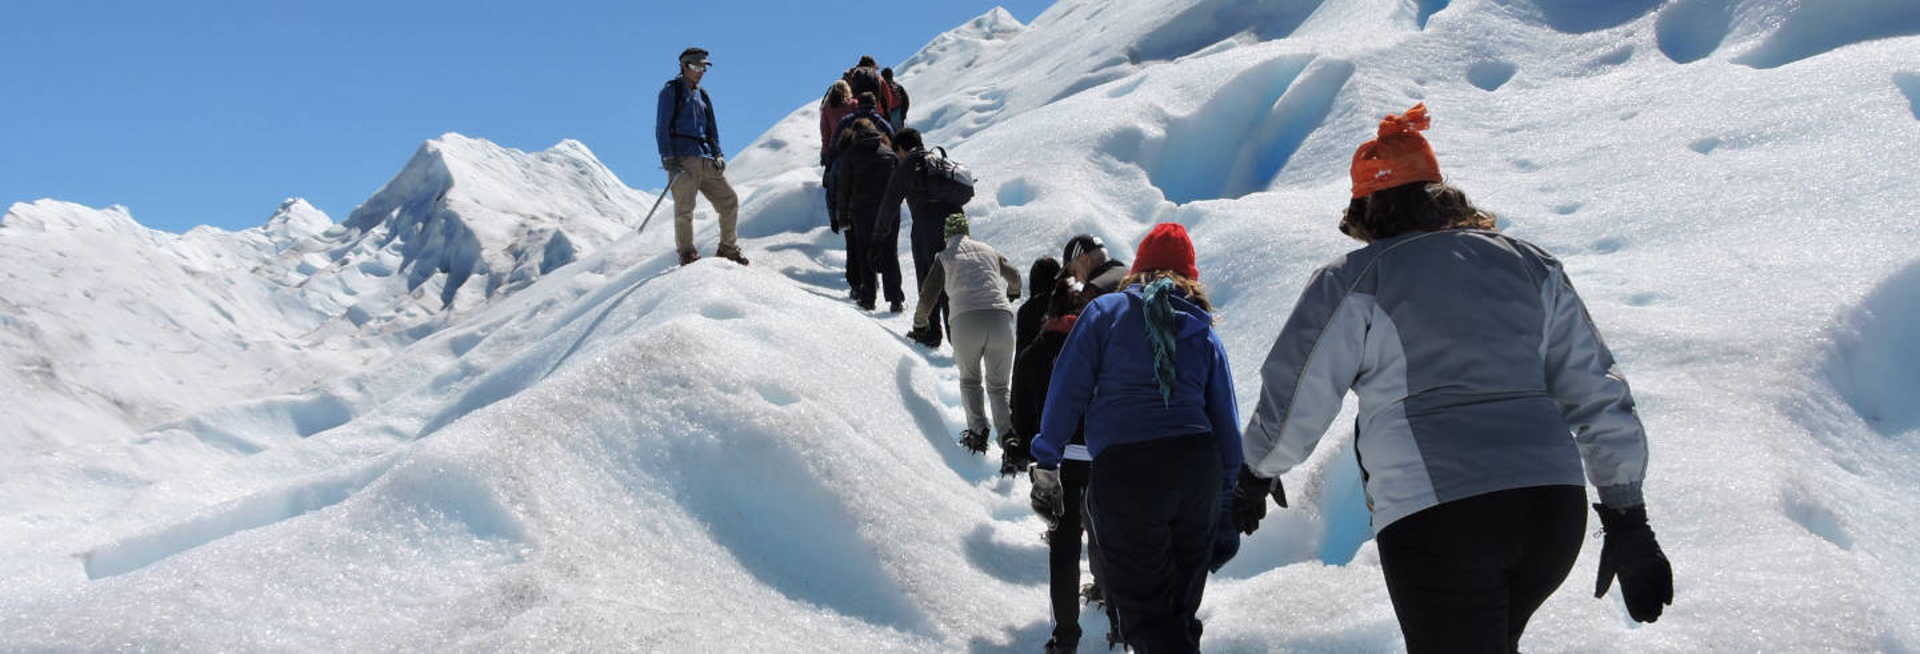 Randonnée au glacier Perito Moreno